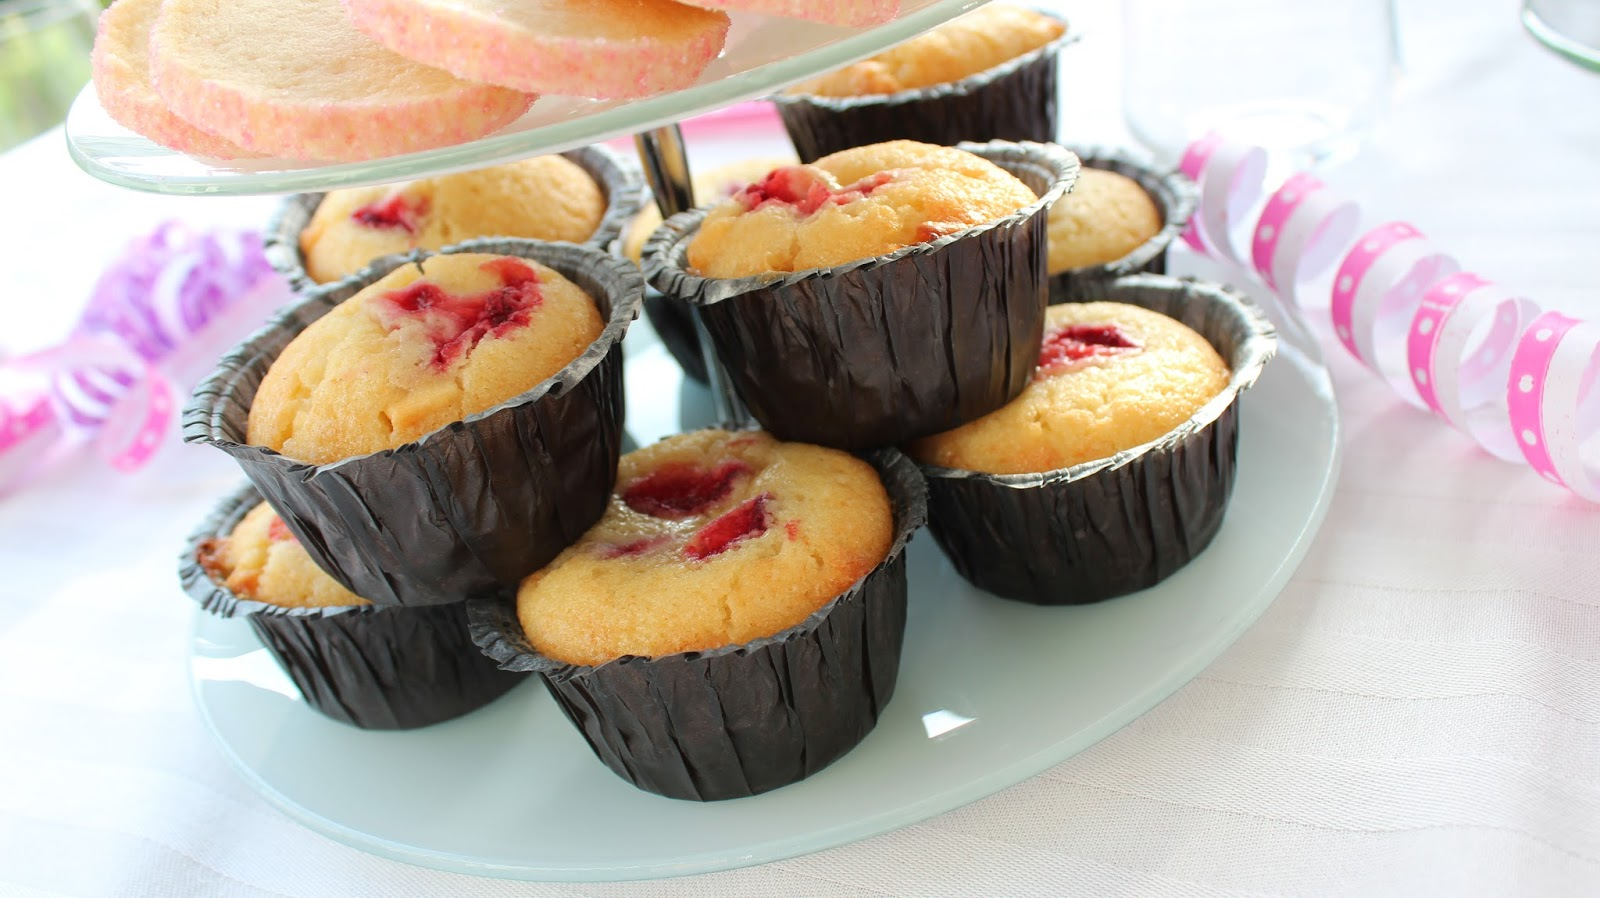 jordgubbsmuffins med vit choklad